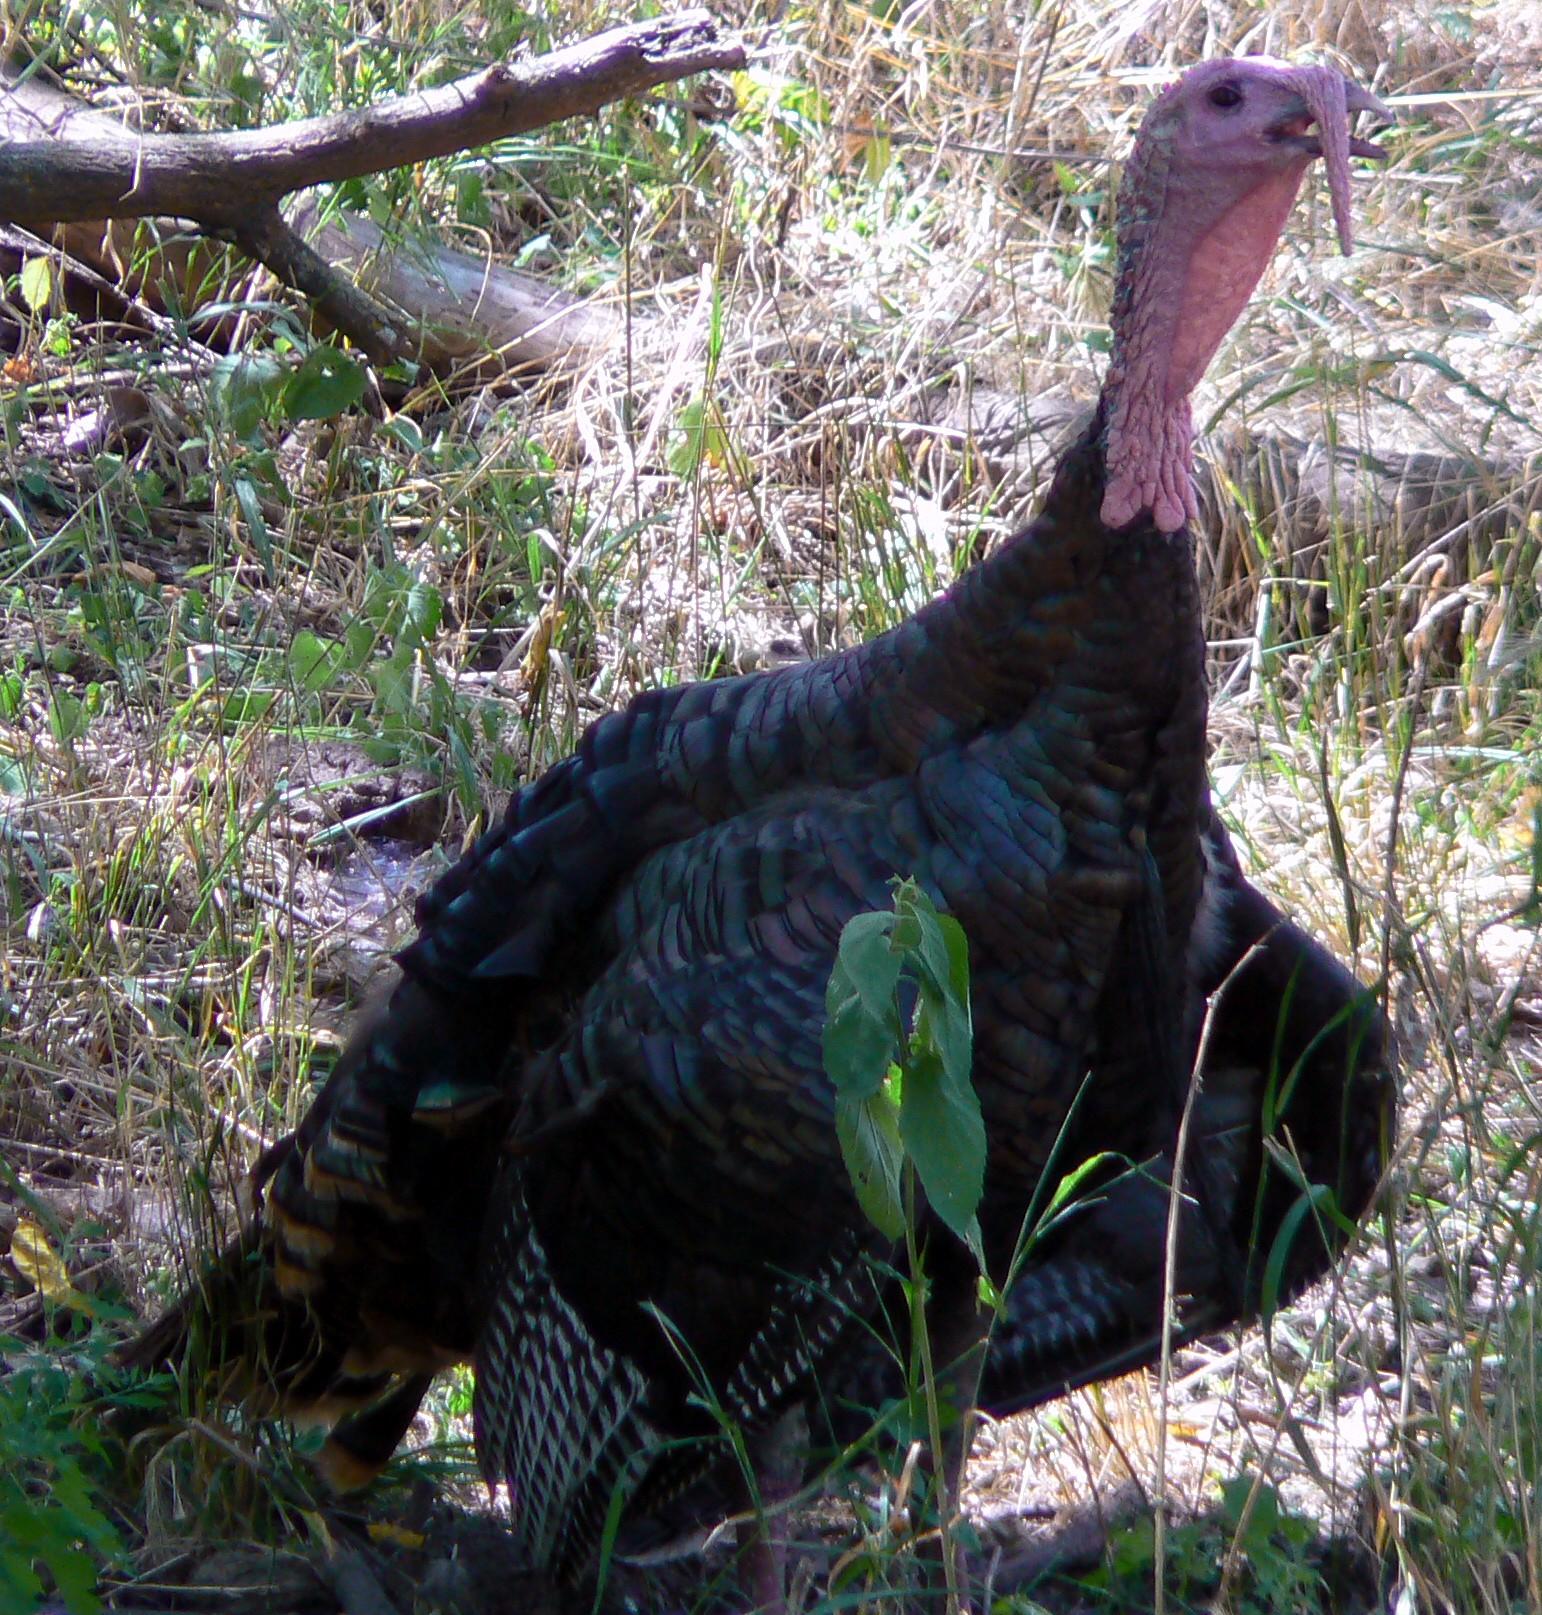 https://upload.wikimedia.org/wikipedia/commons/6/69/Meleagris_gallopavo_Wild_Turkey.jpg